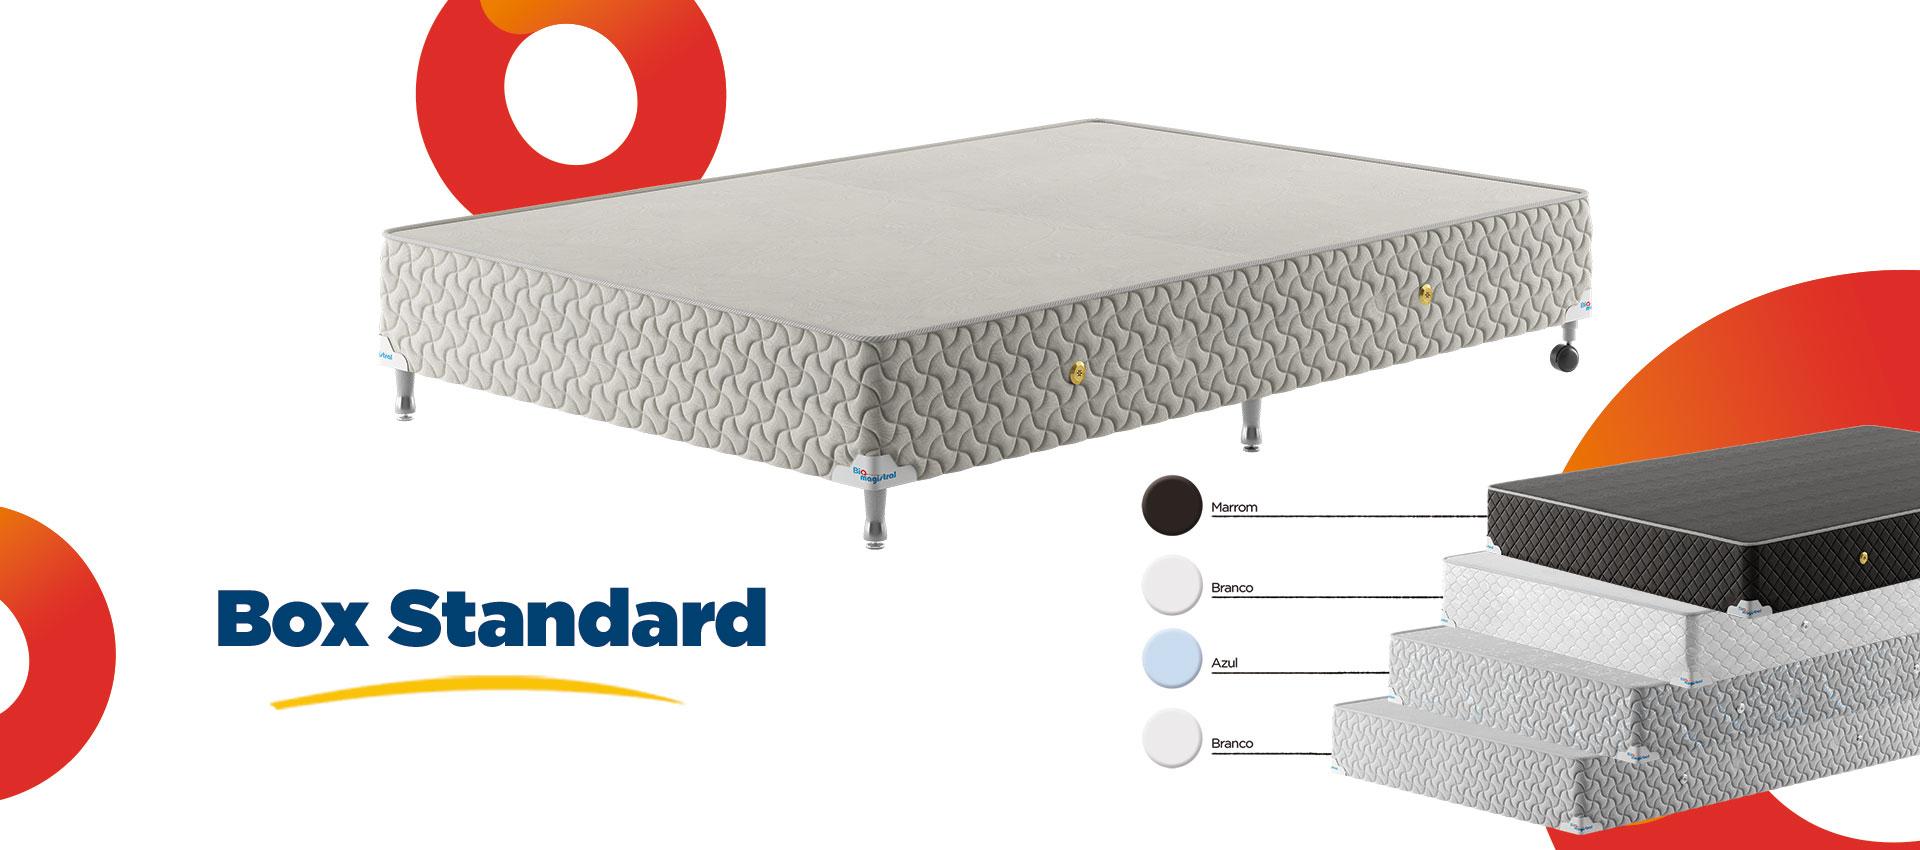 Box Standard